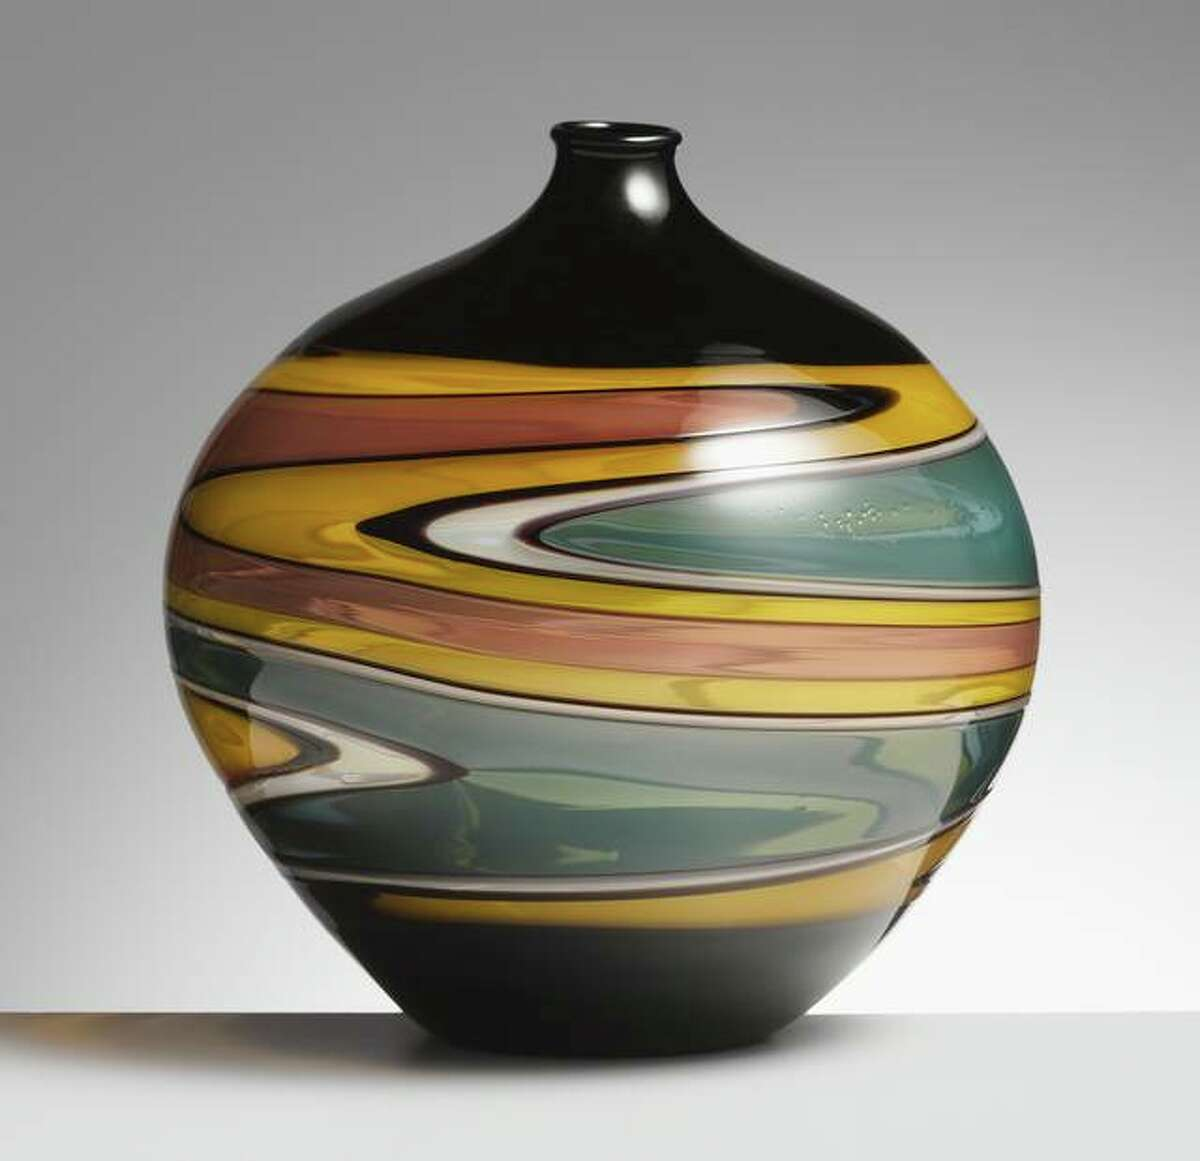 Artwork made by Sarah Shoot, Reinhard Herzog and Andrew Koester. Reinhard Herzog